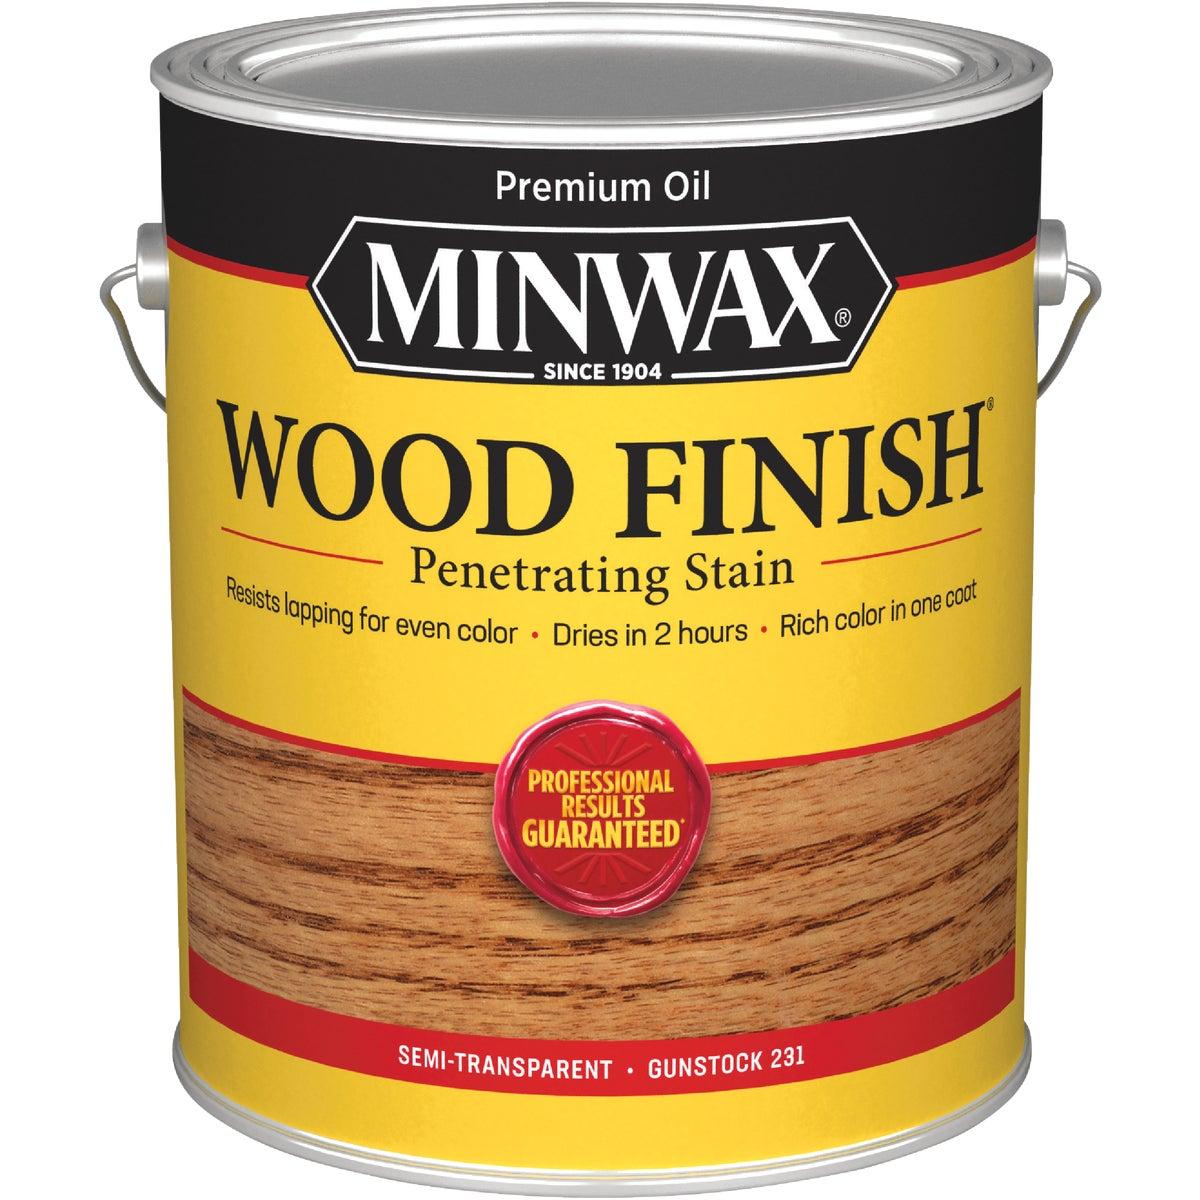 GUNSTOCK WOOD STAIN - 710450000 by Minwax Company